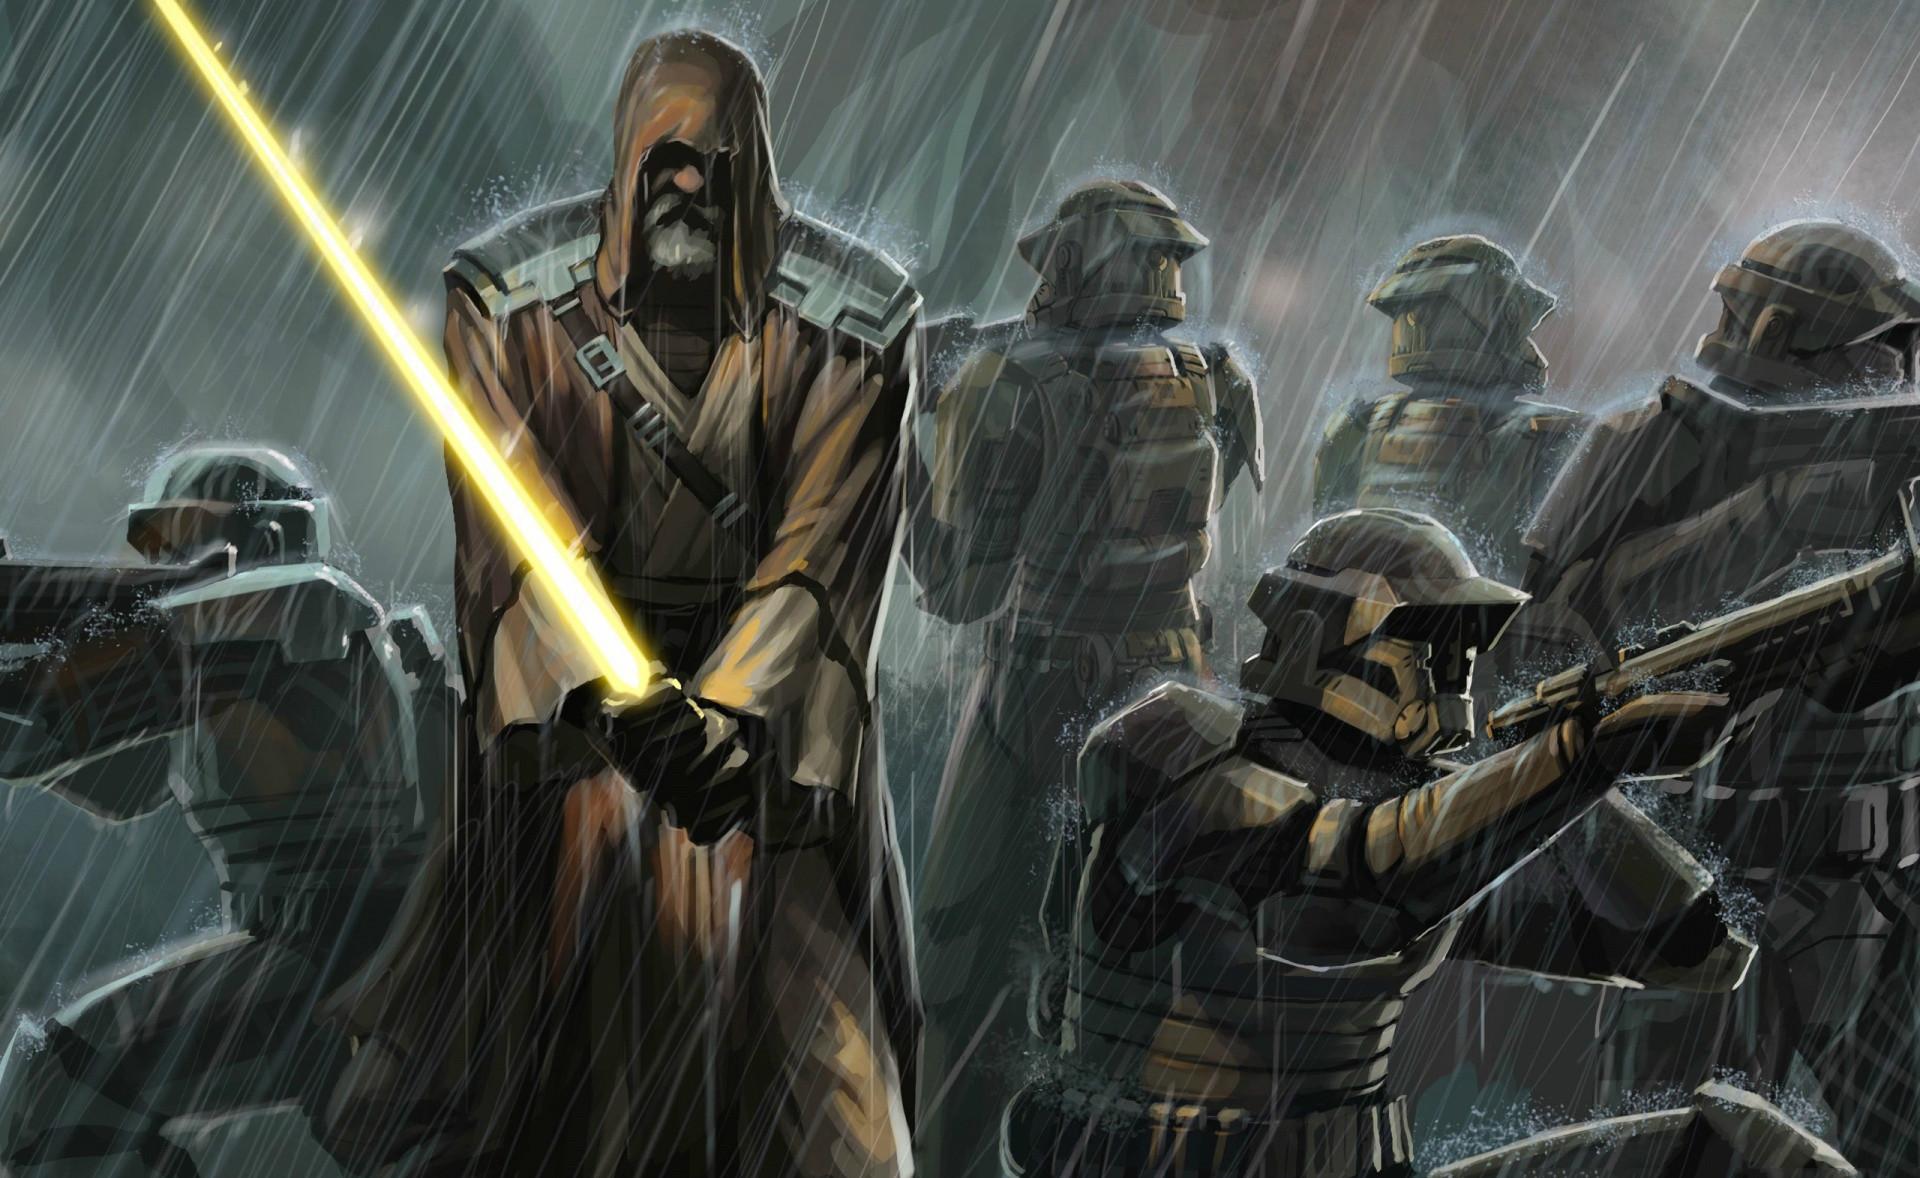 Starwars Wallpaper Cellphone: Star Wars Clone Trooper Wallpaper ·① WallpaperTag